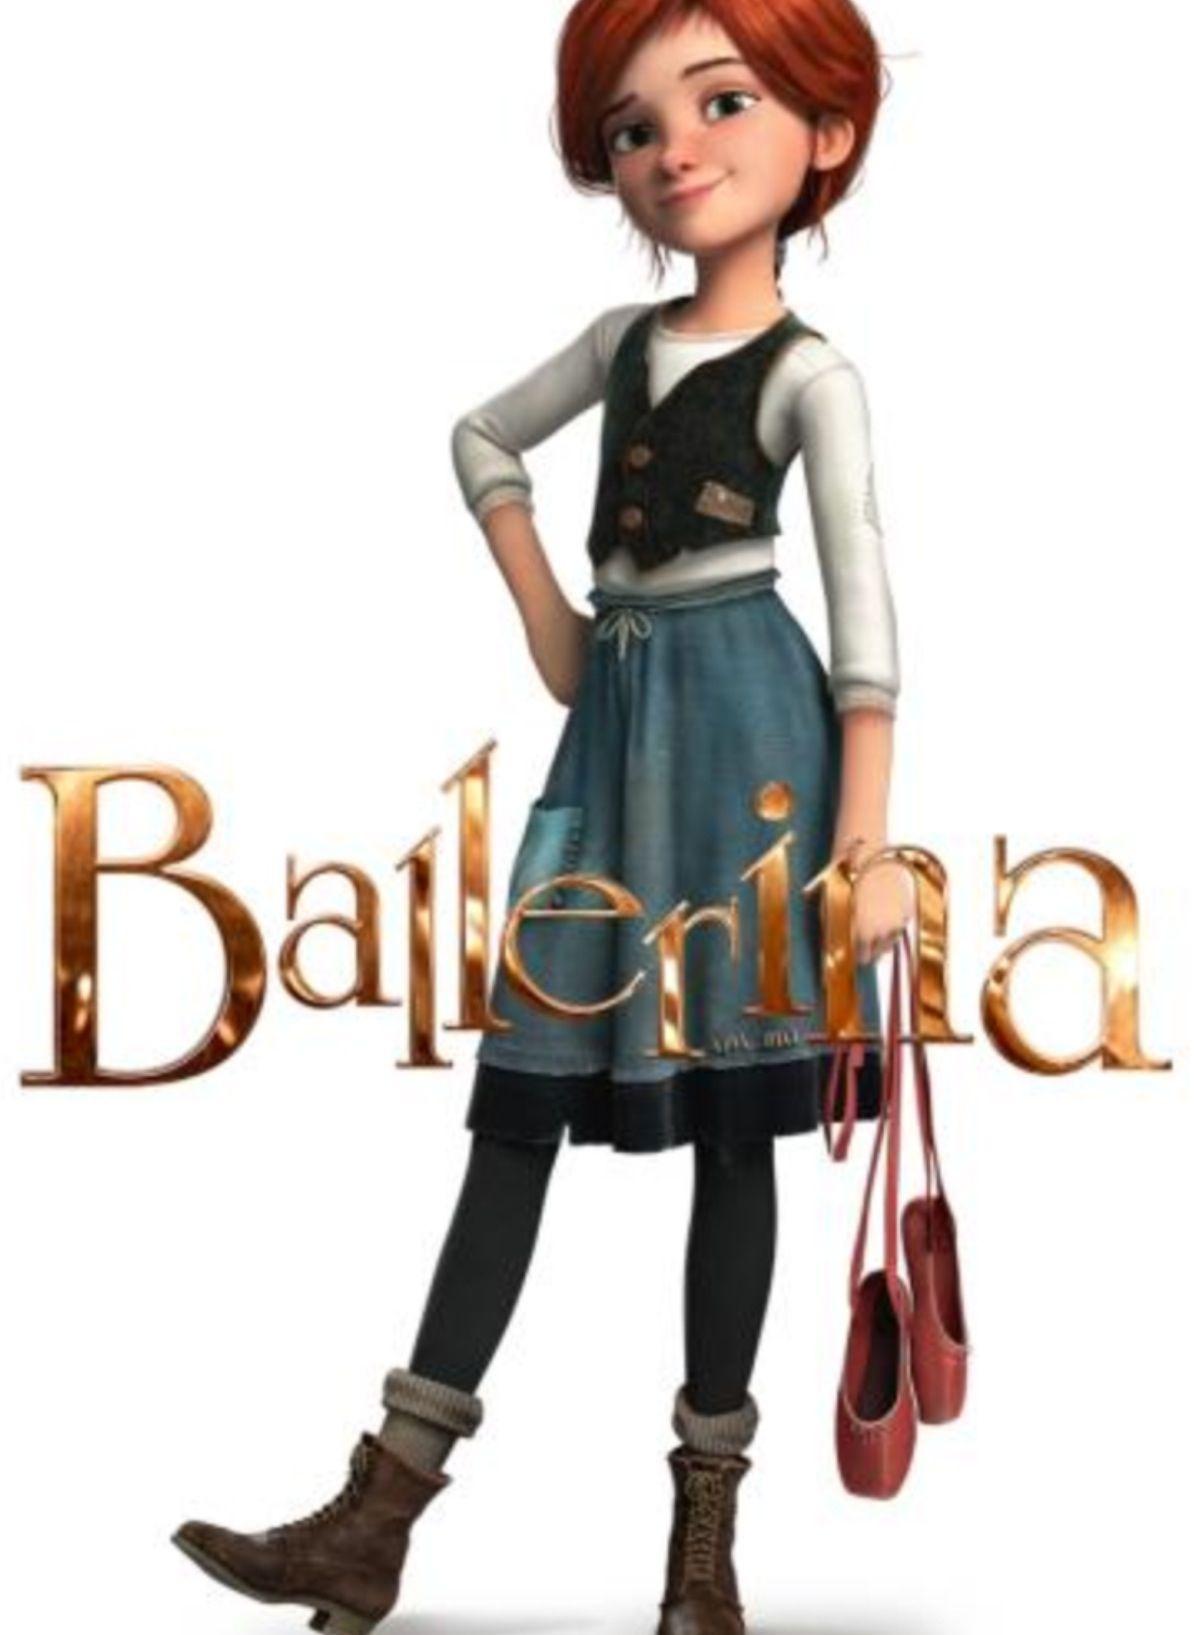 Felicie -Ballerina Le Film